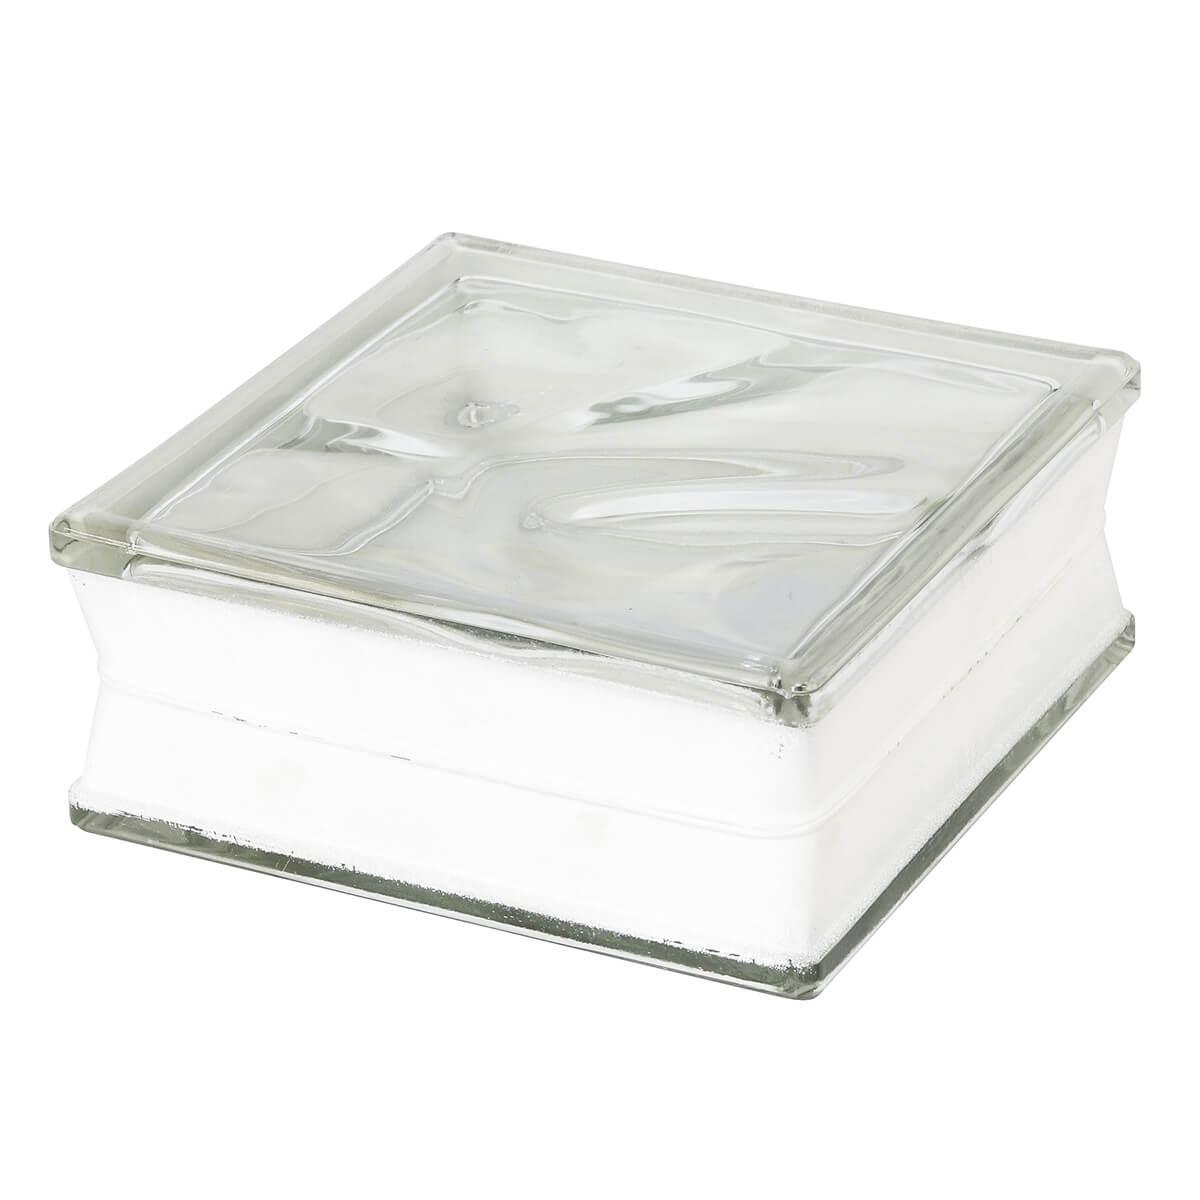 Bloco de Vidro Ondulado Incolor 19x19x8cm - Seves Glassblock